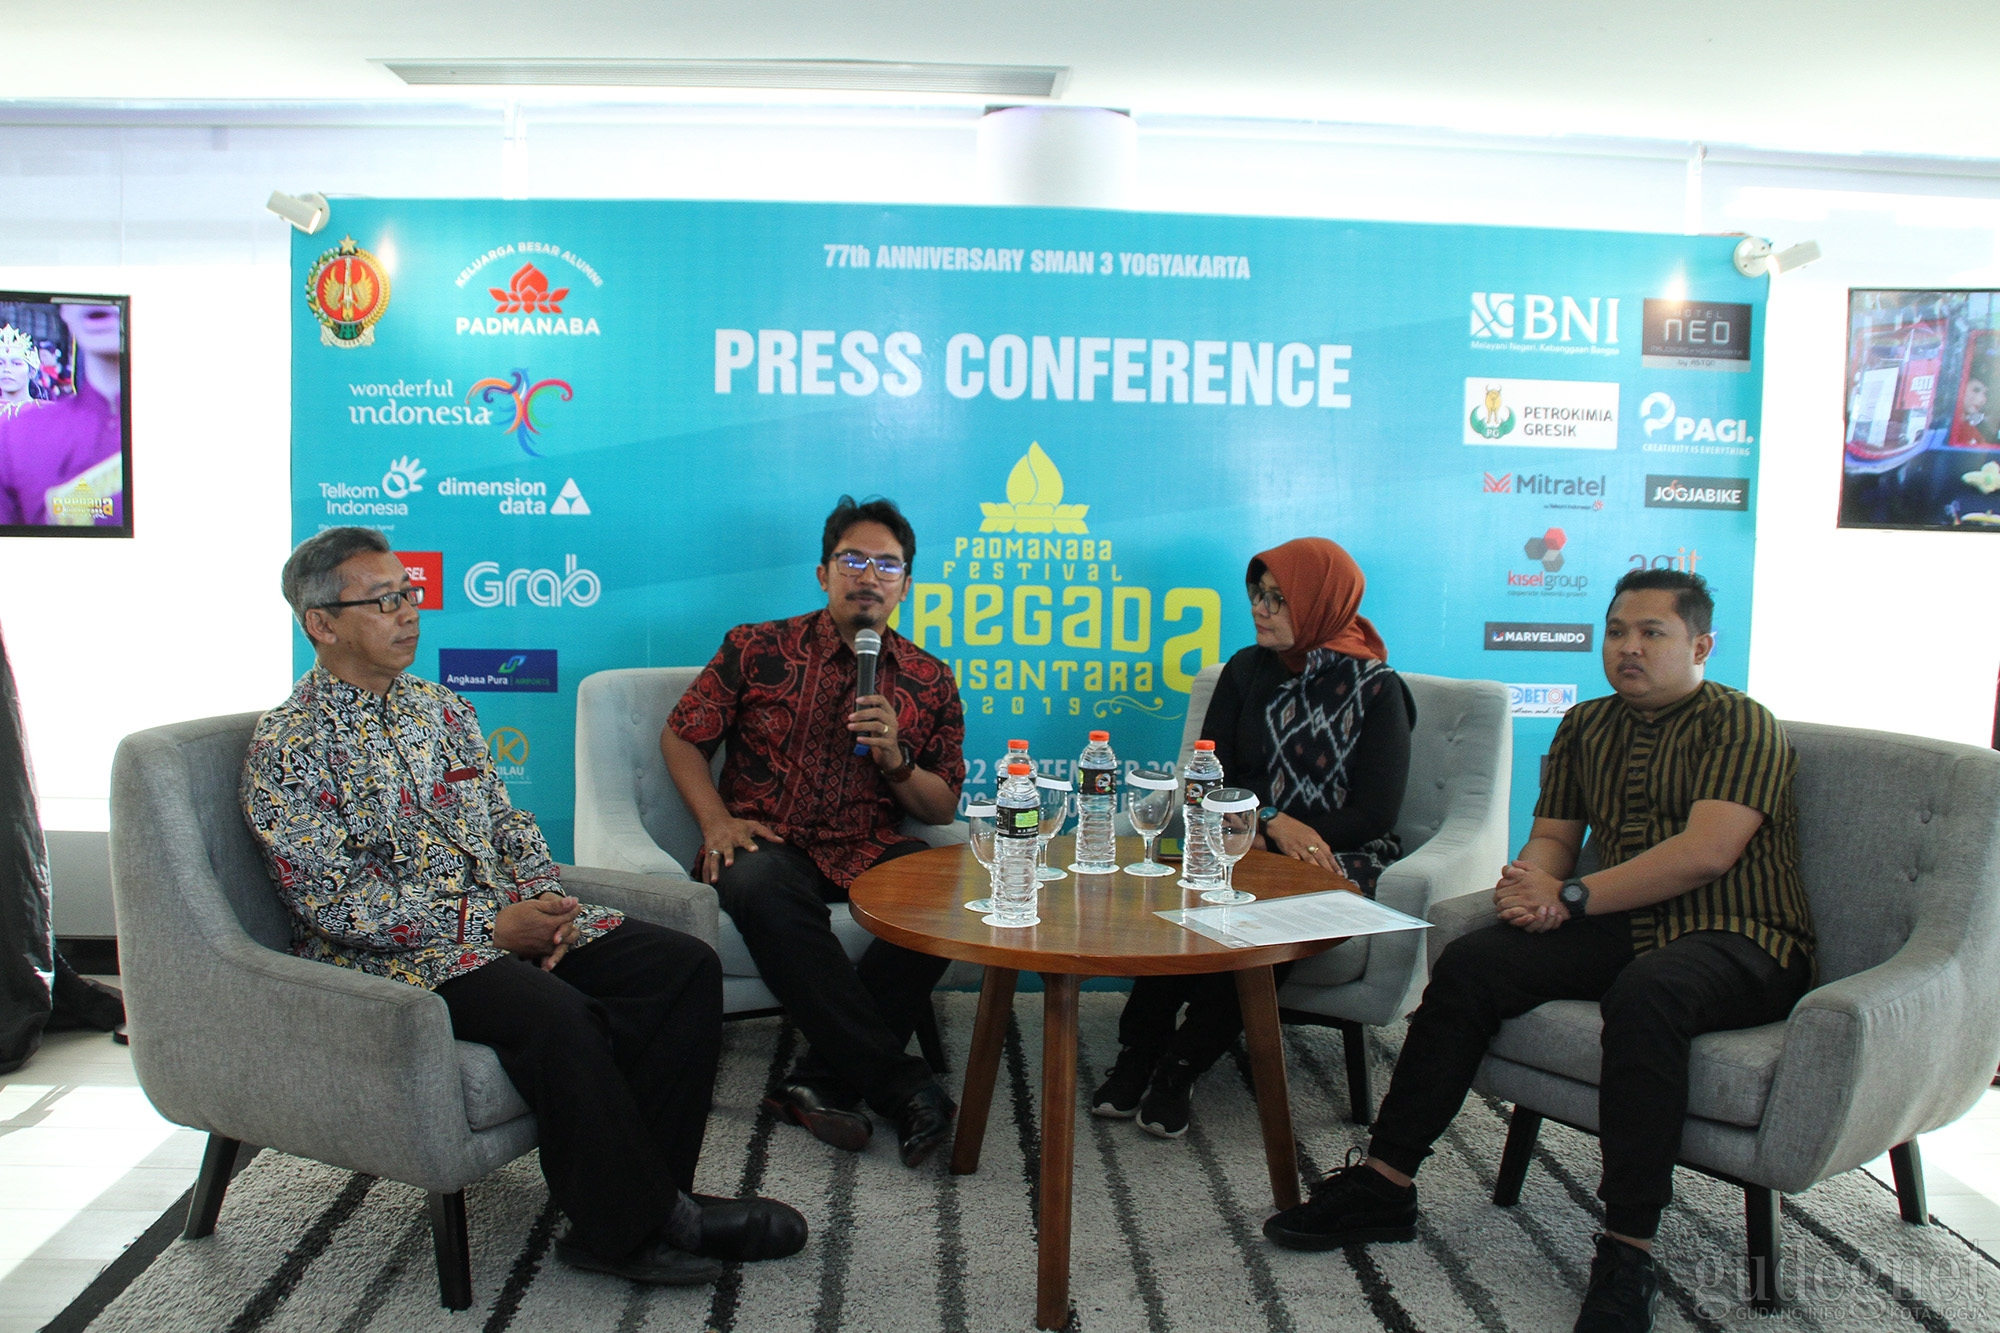 Padmanaba Kembali Gelar Festival Bregada Nusantara